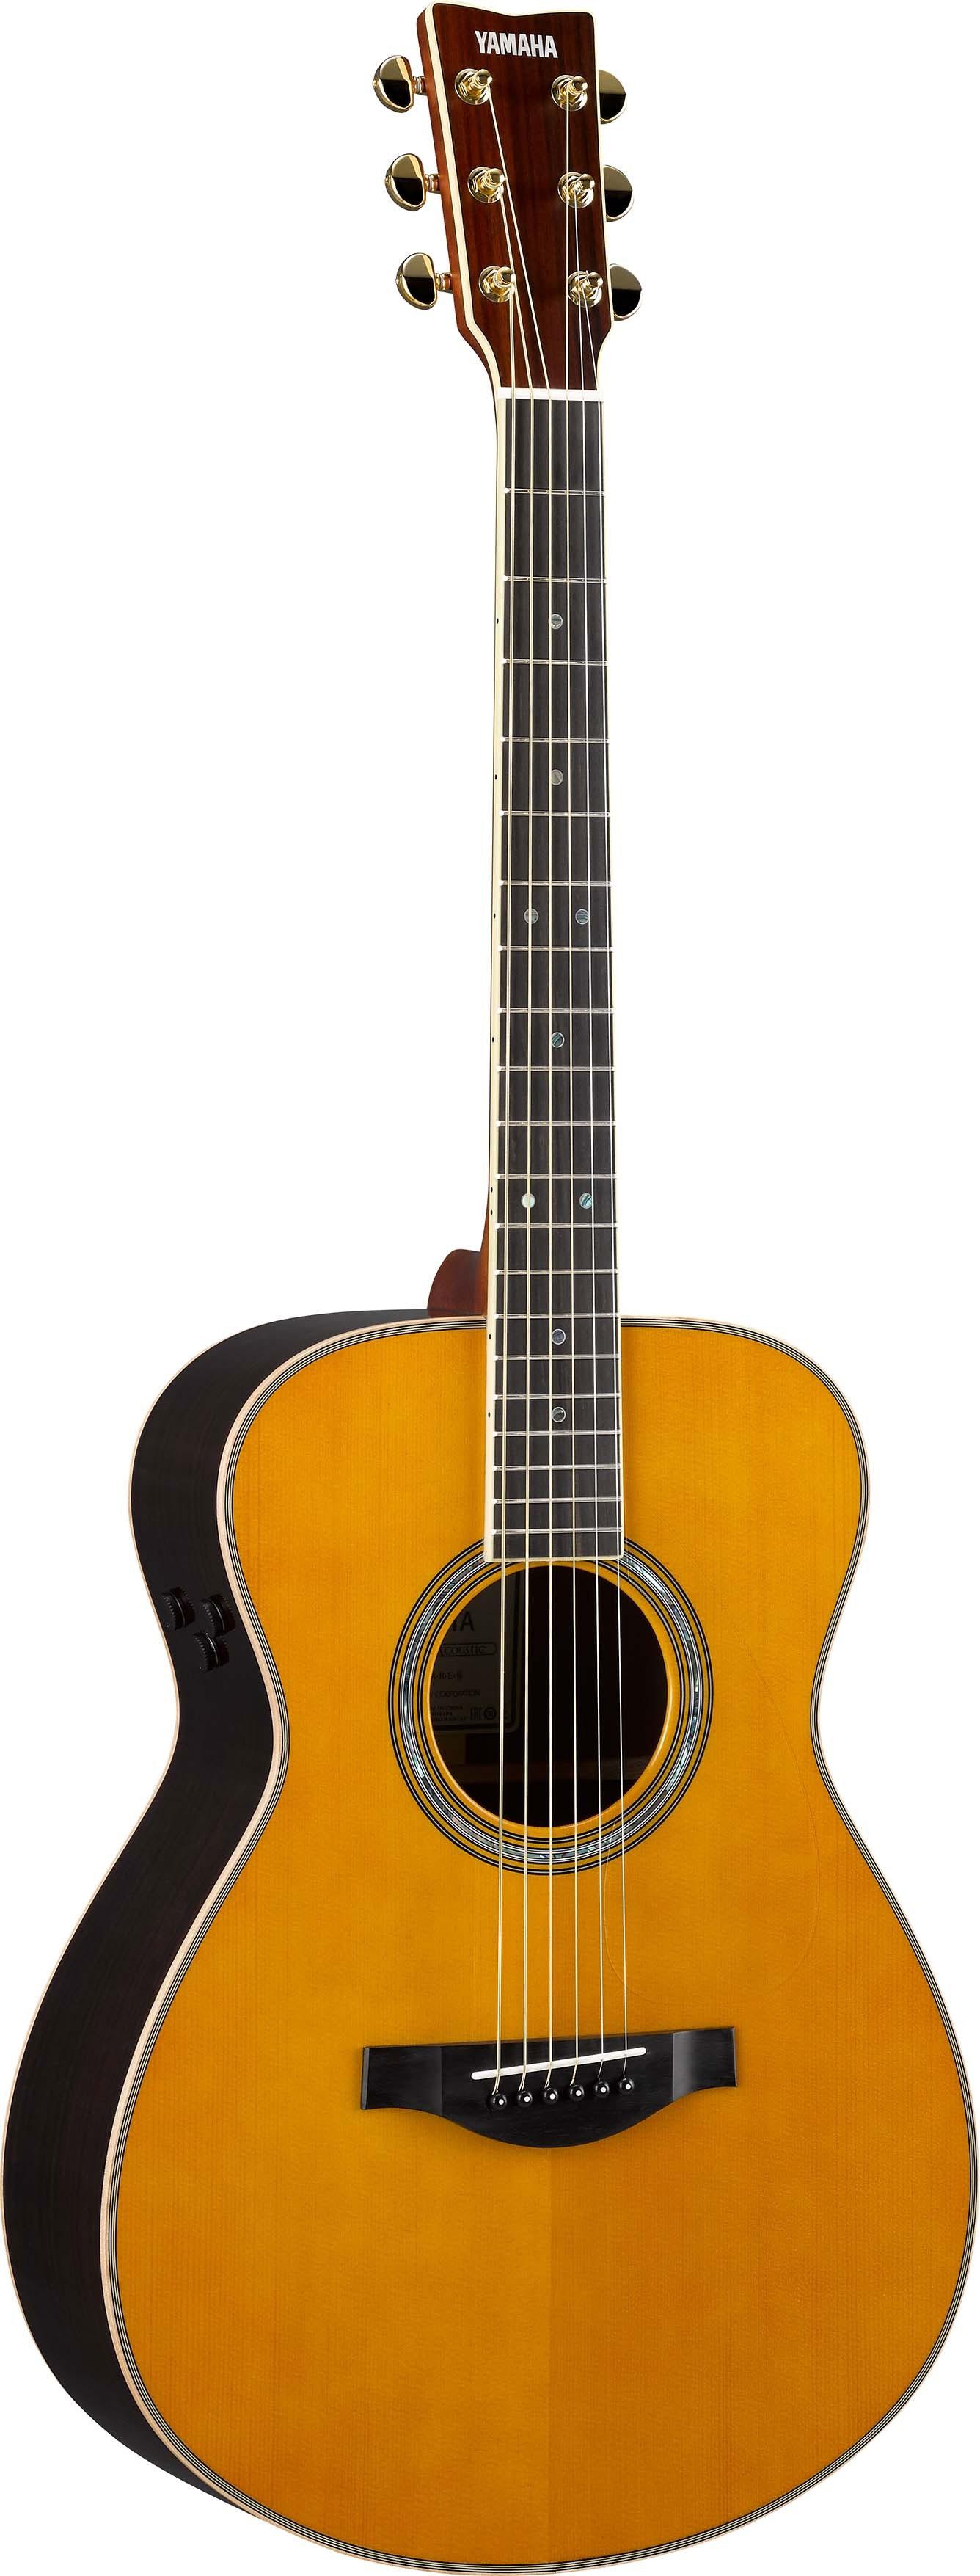 Yamaha ls ta transacoustic guitar revolutionary small body for Yamaha ls ta